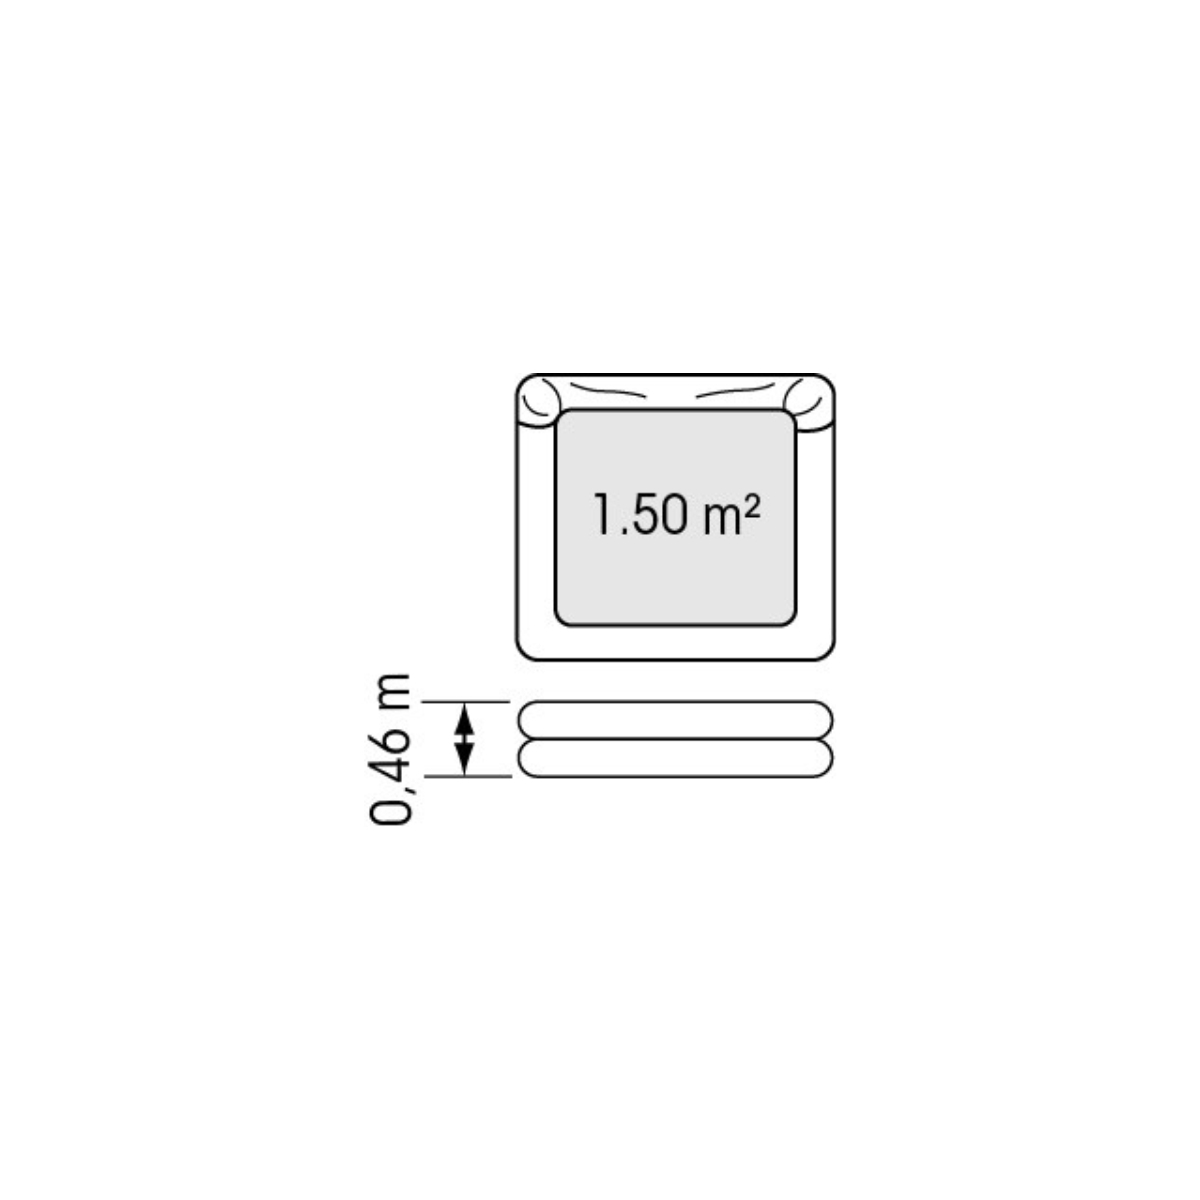 Coastal liferaft, ISO 9650-2